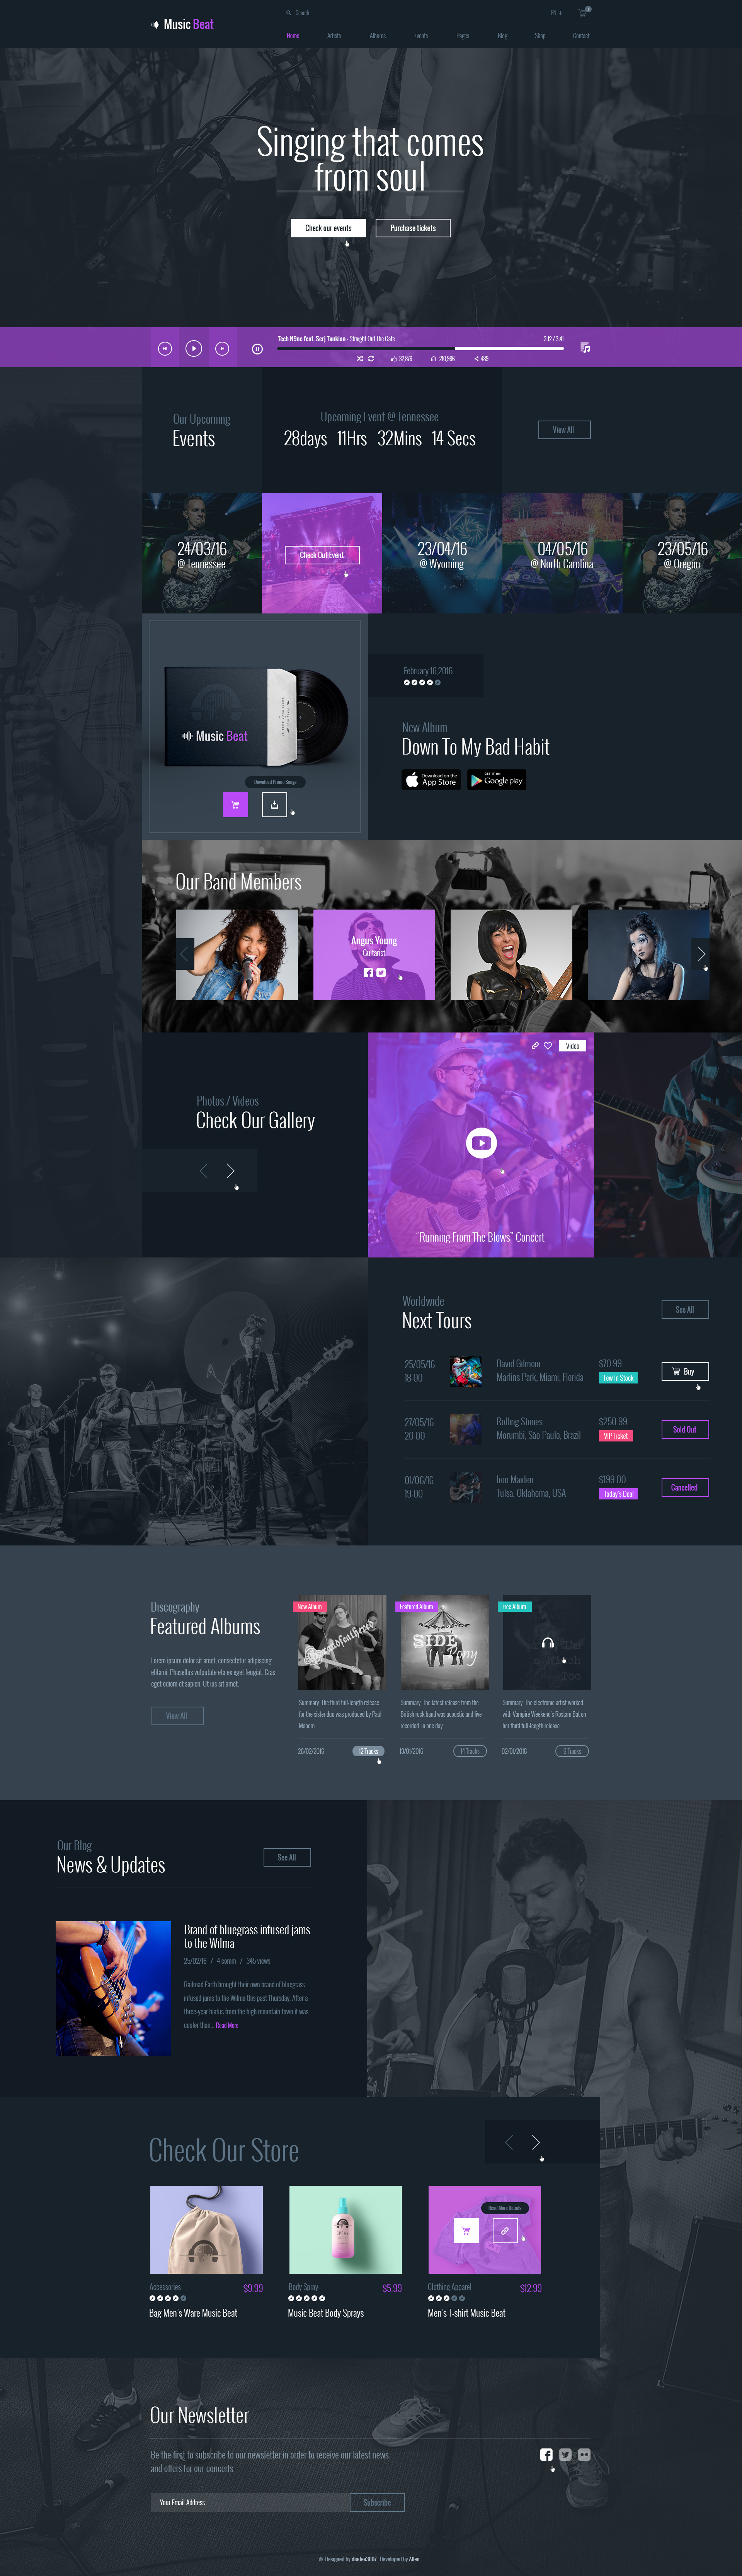 MusicBeat designed by #diadea3007 for #music bands #artist #website #multipurpose #purple #html